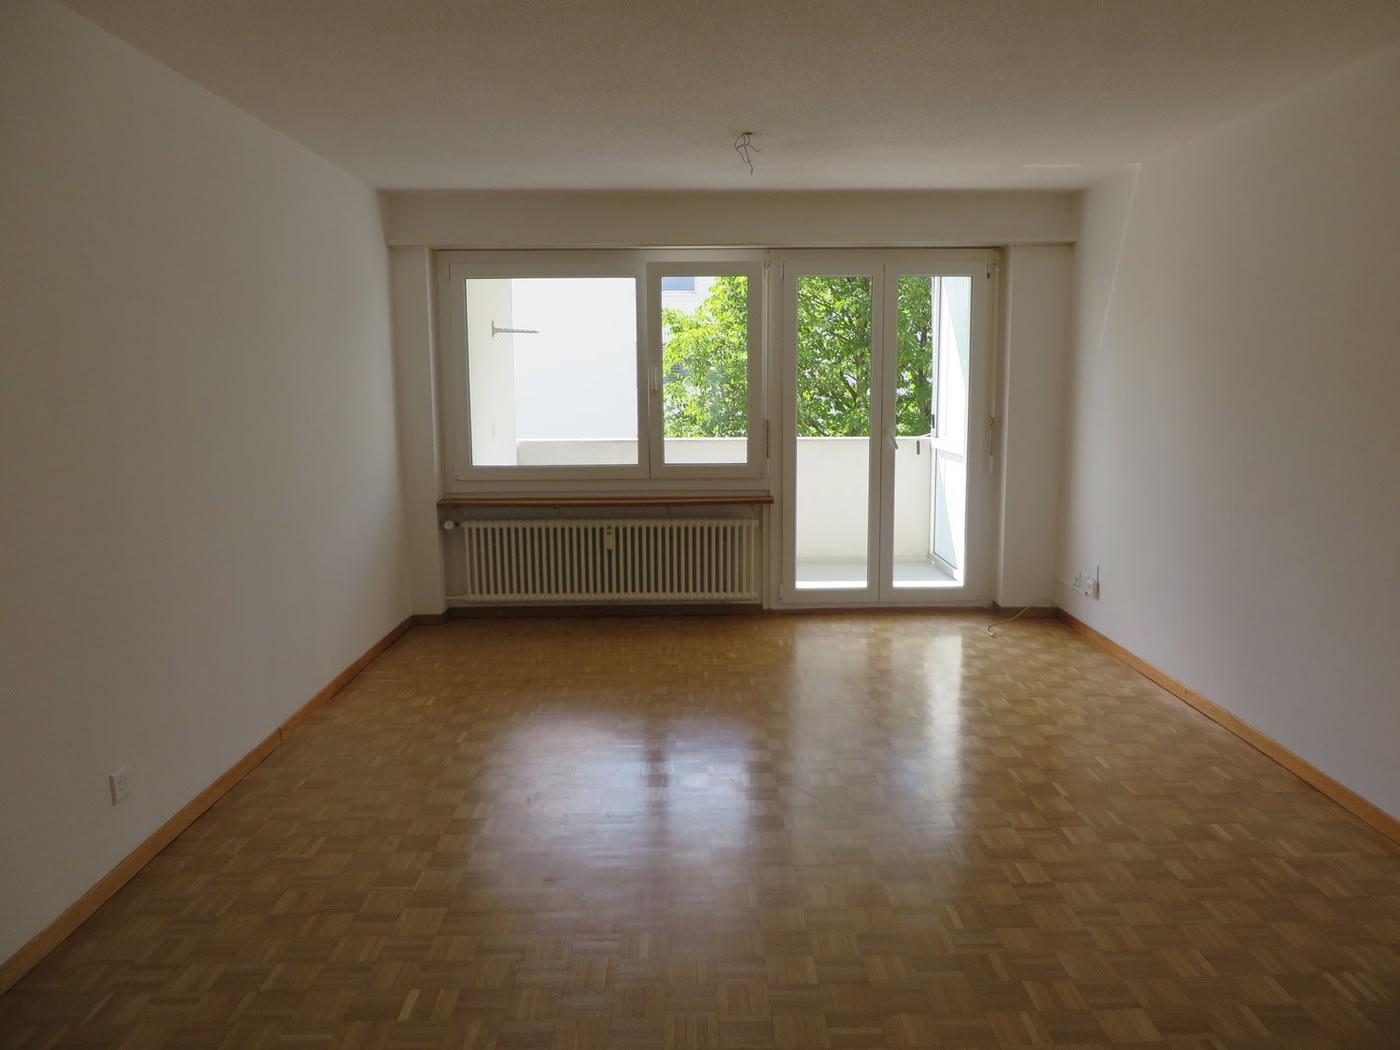 Waldhofstrasse 30